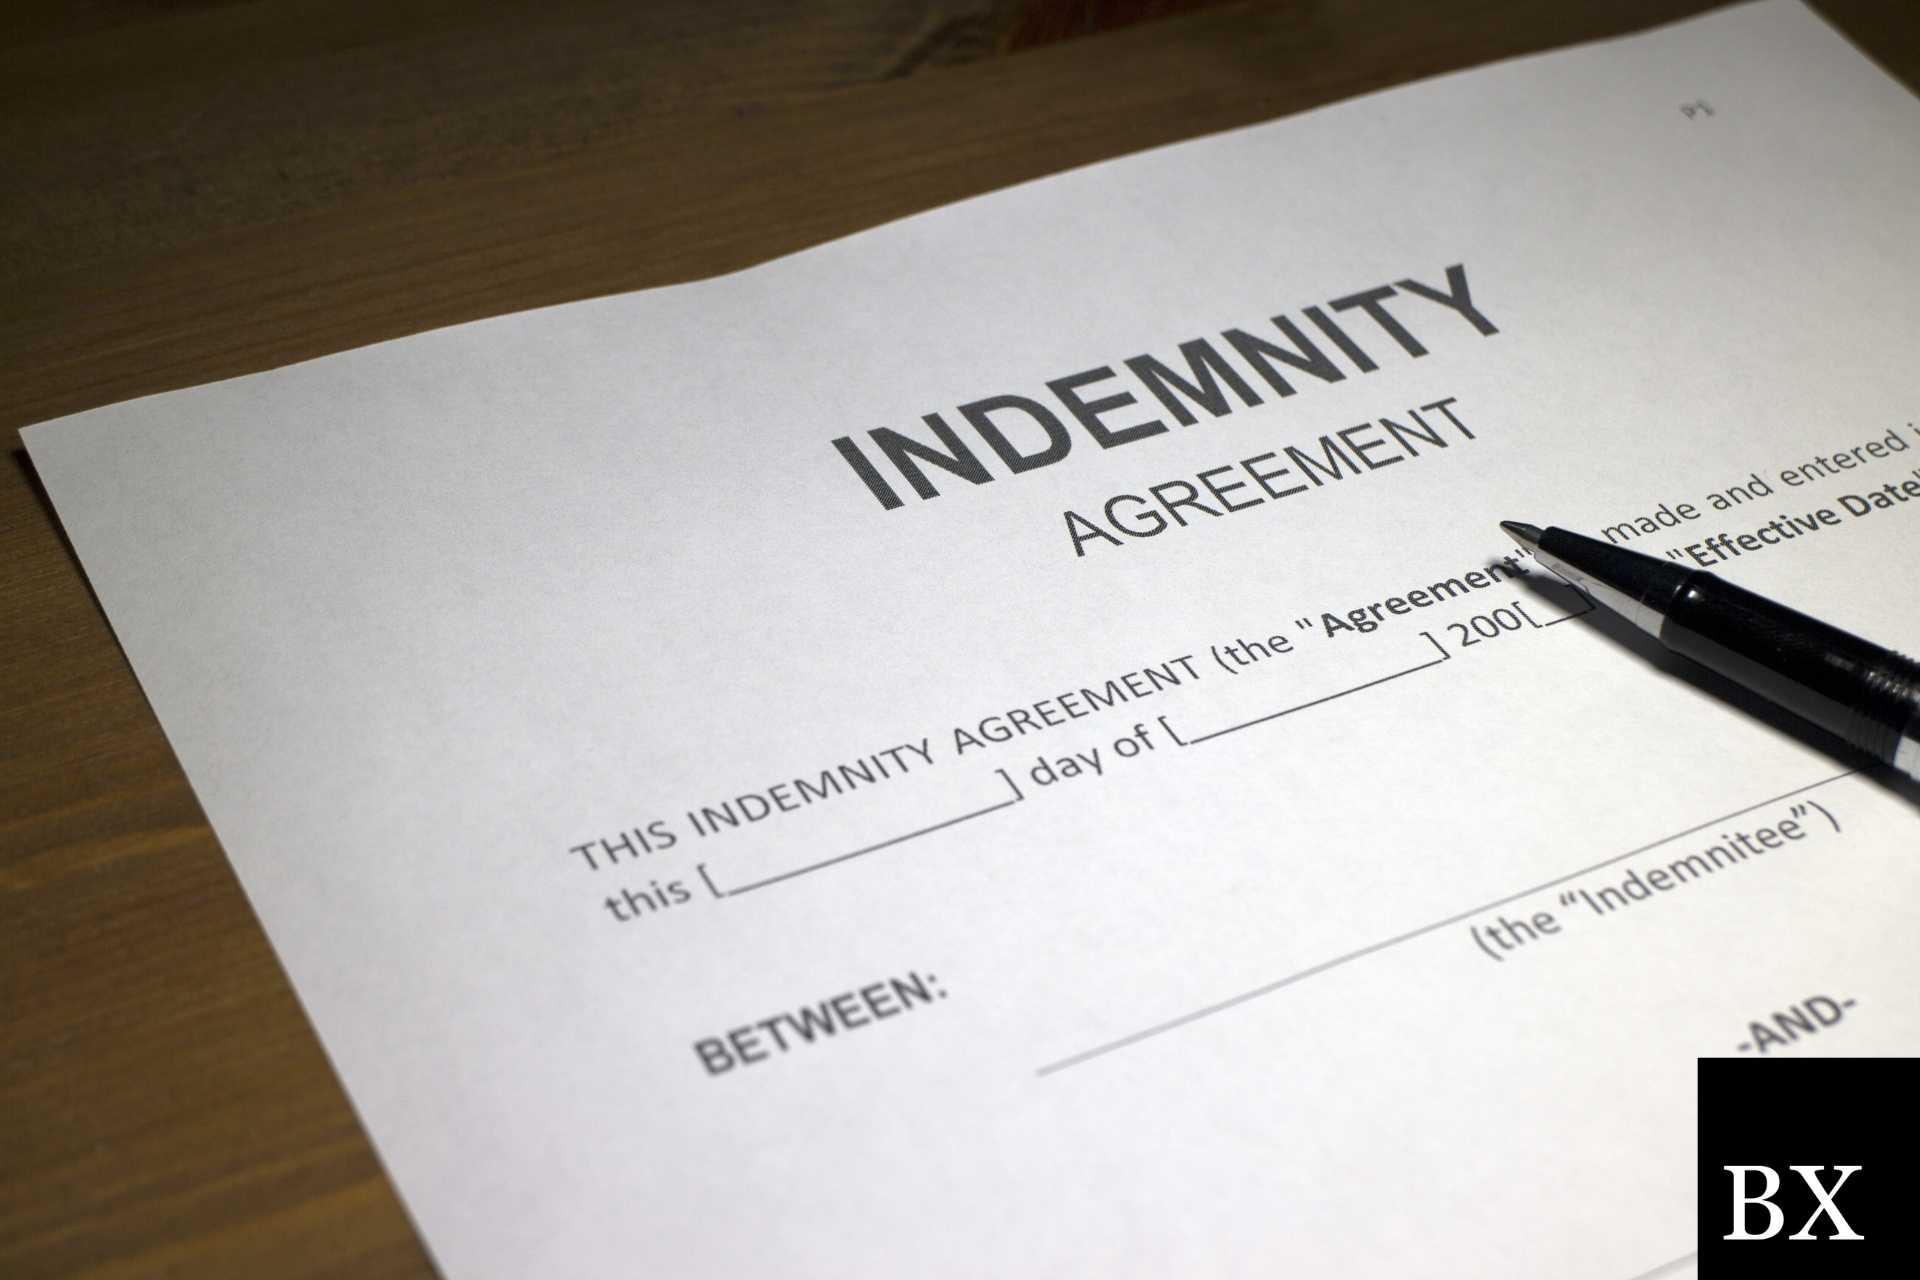 Indemnity Agreement